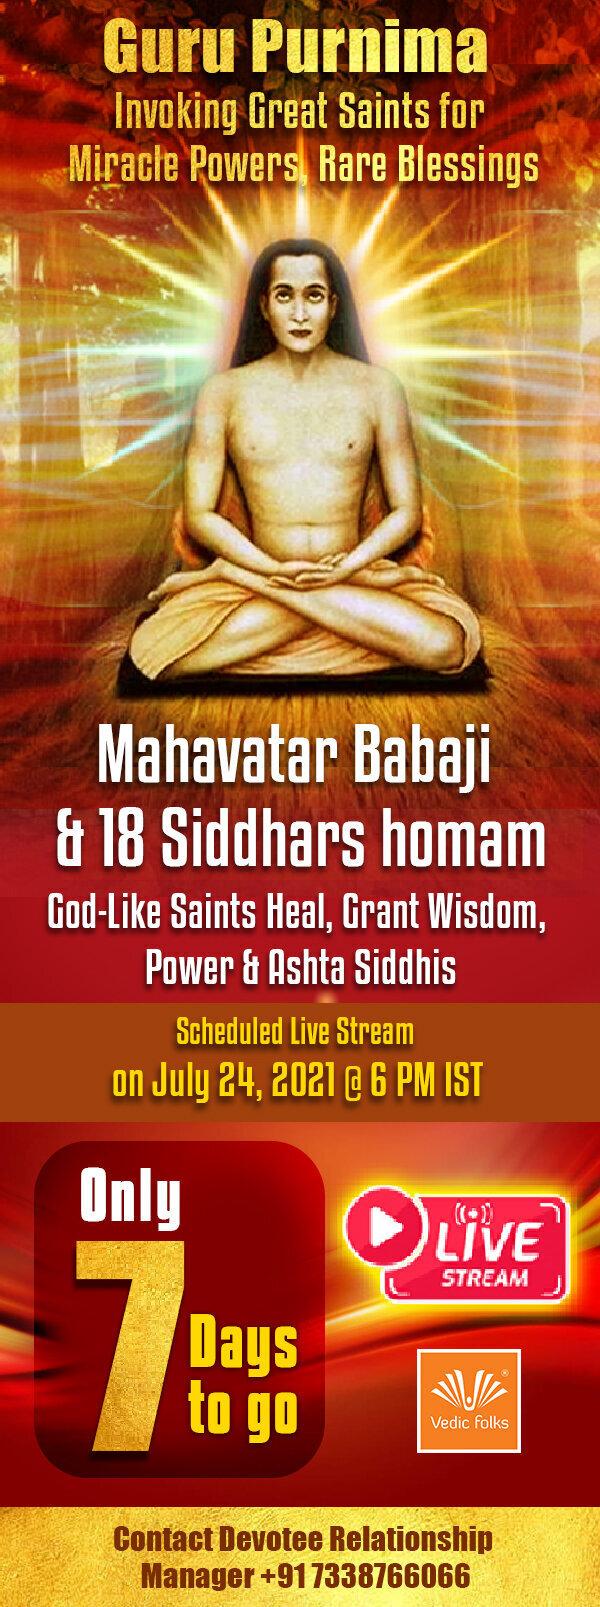 Exclusive Live Stream Mahavatar Babaji & 18 Siddhar Homam